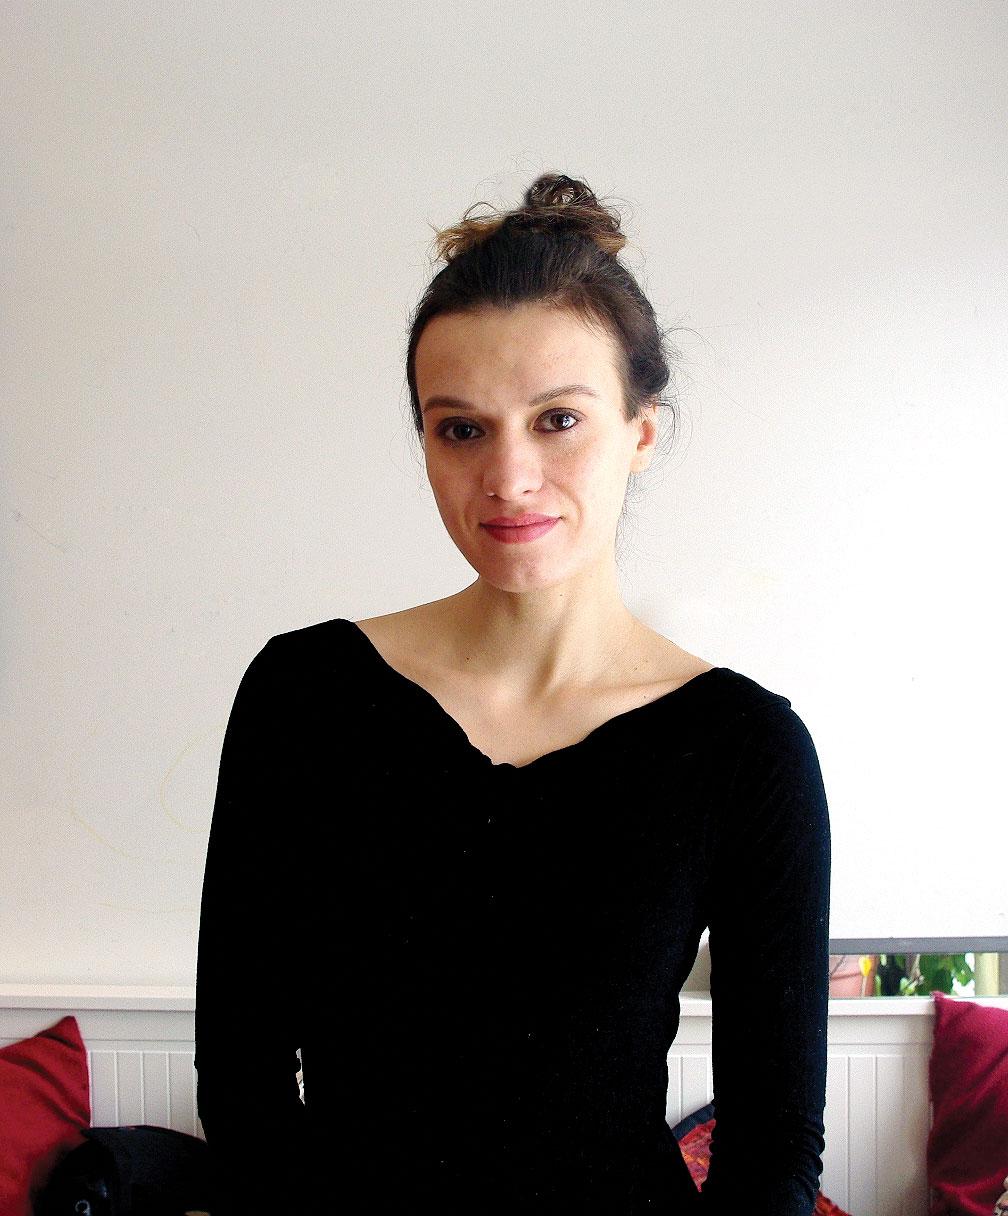 Jowita Bydlowska, author of Drunk Mom